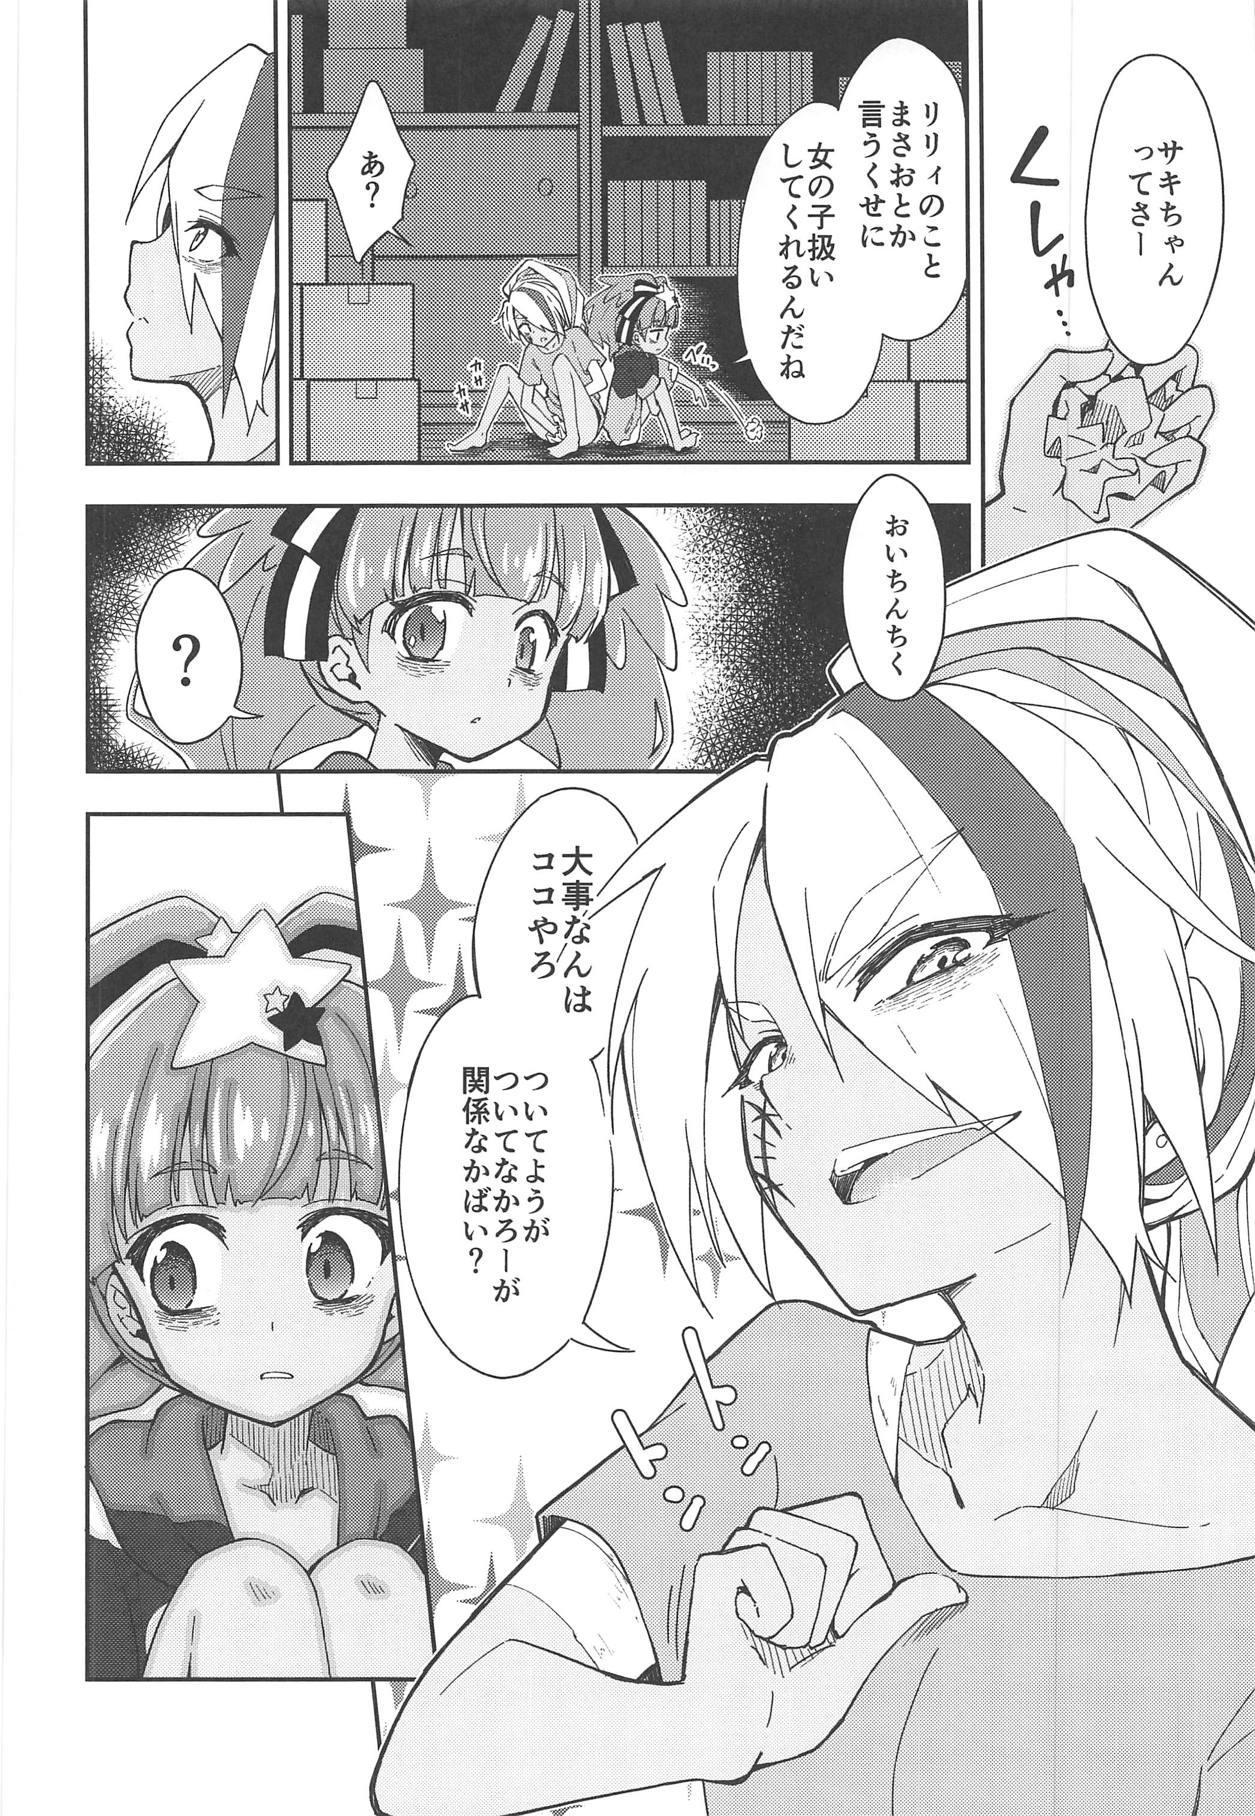 Lovely Girls' Lily Vol. 18 13